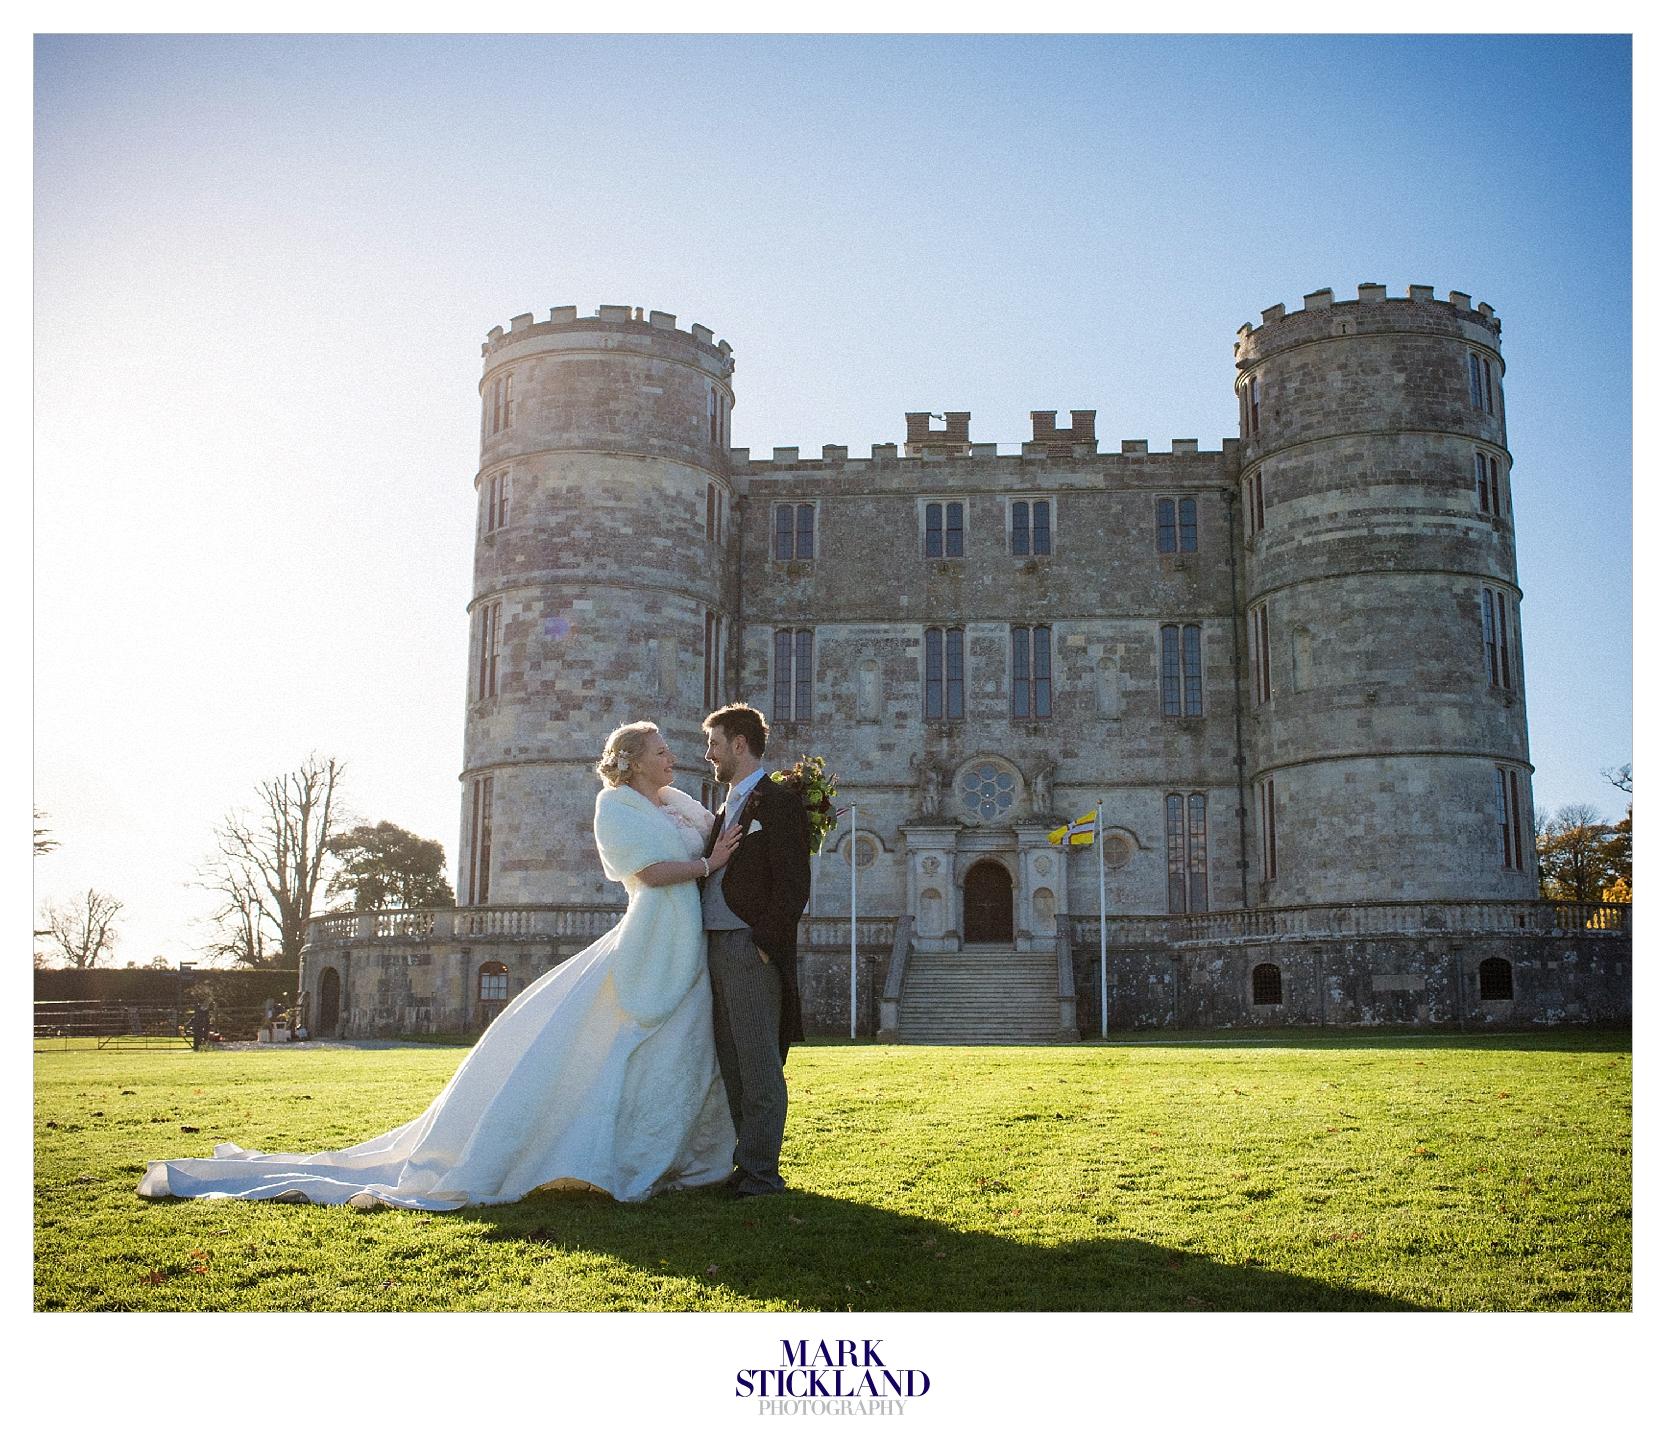 lulworth_castle_wedding_dorset_mark stickland photography.25